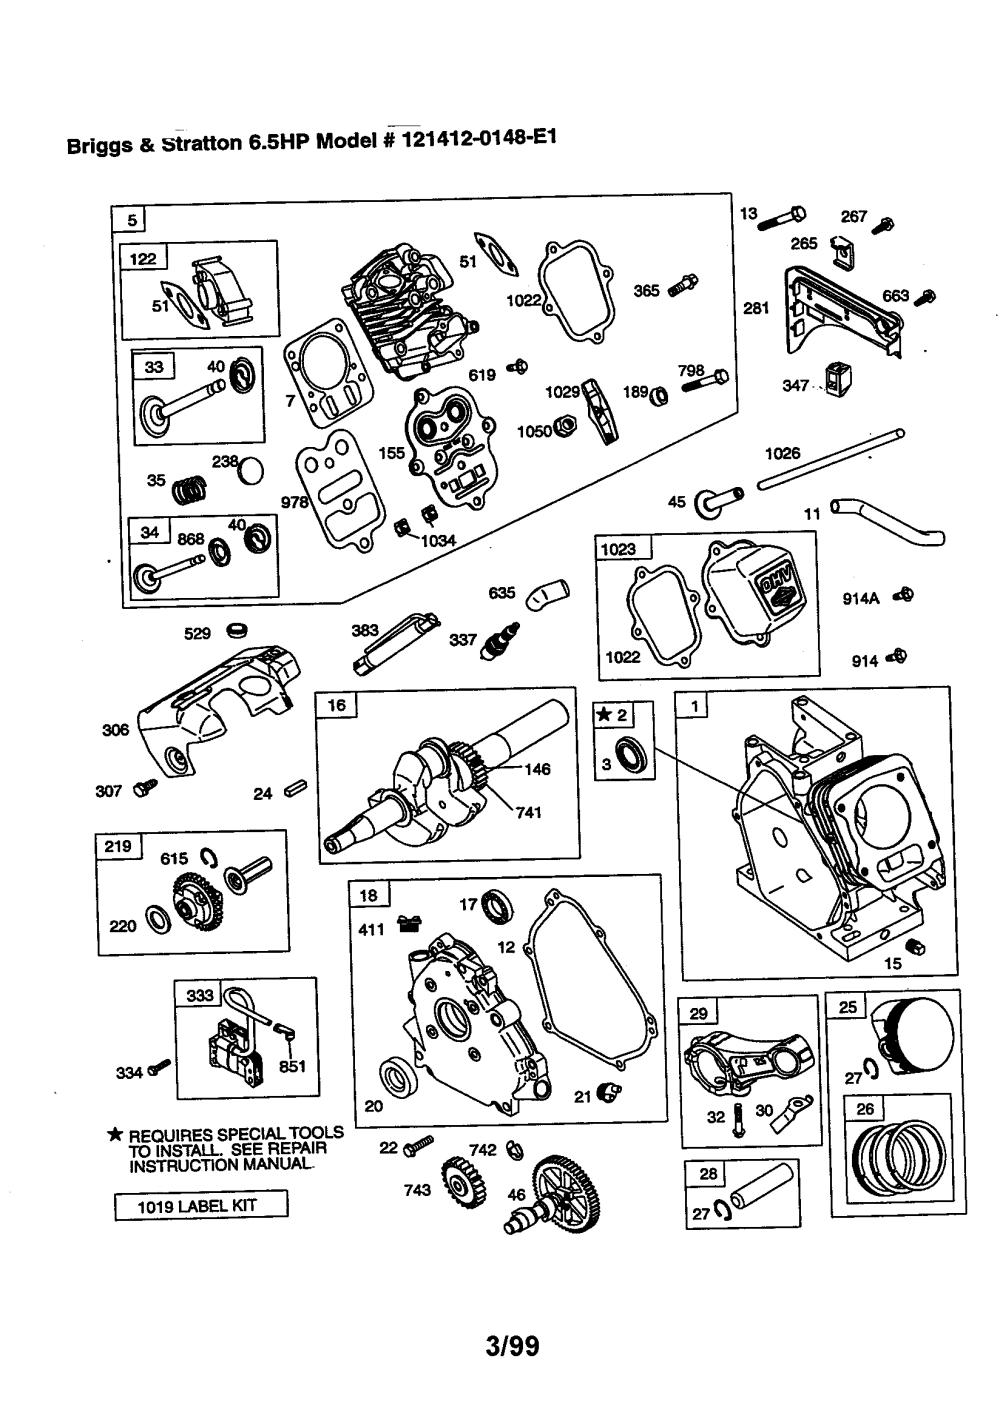 medium resolution of briggs stratton model 121412 0148 e1 engine genuine parts rh searspartsdirect com 17 hp briggs and